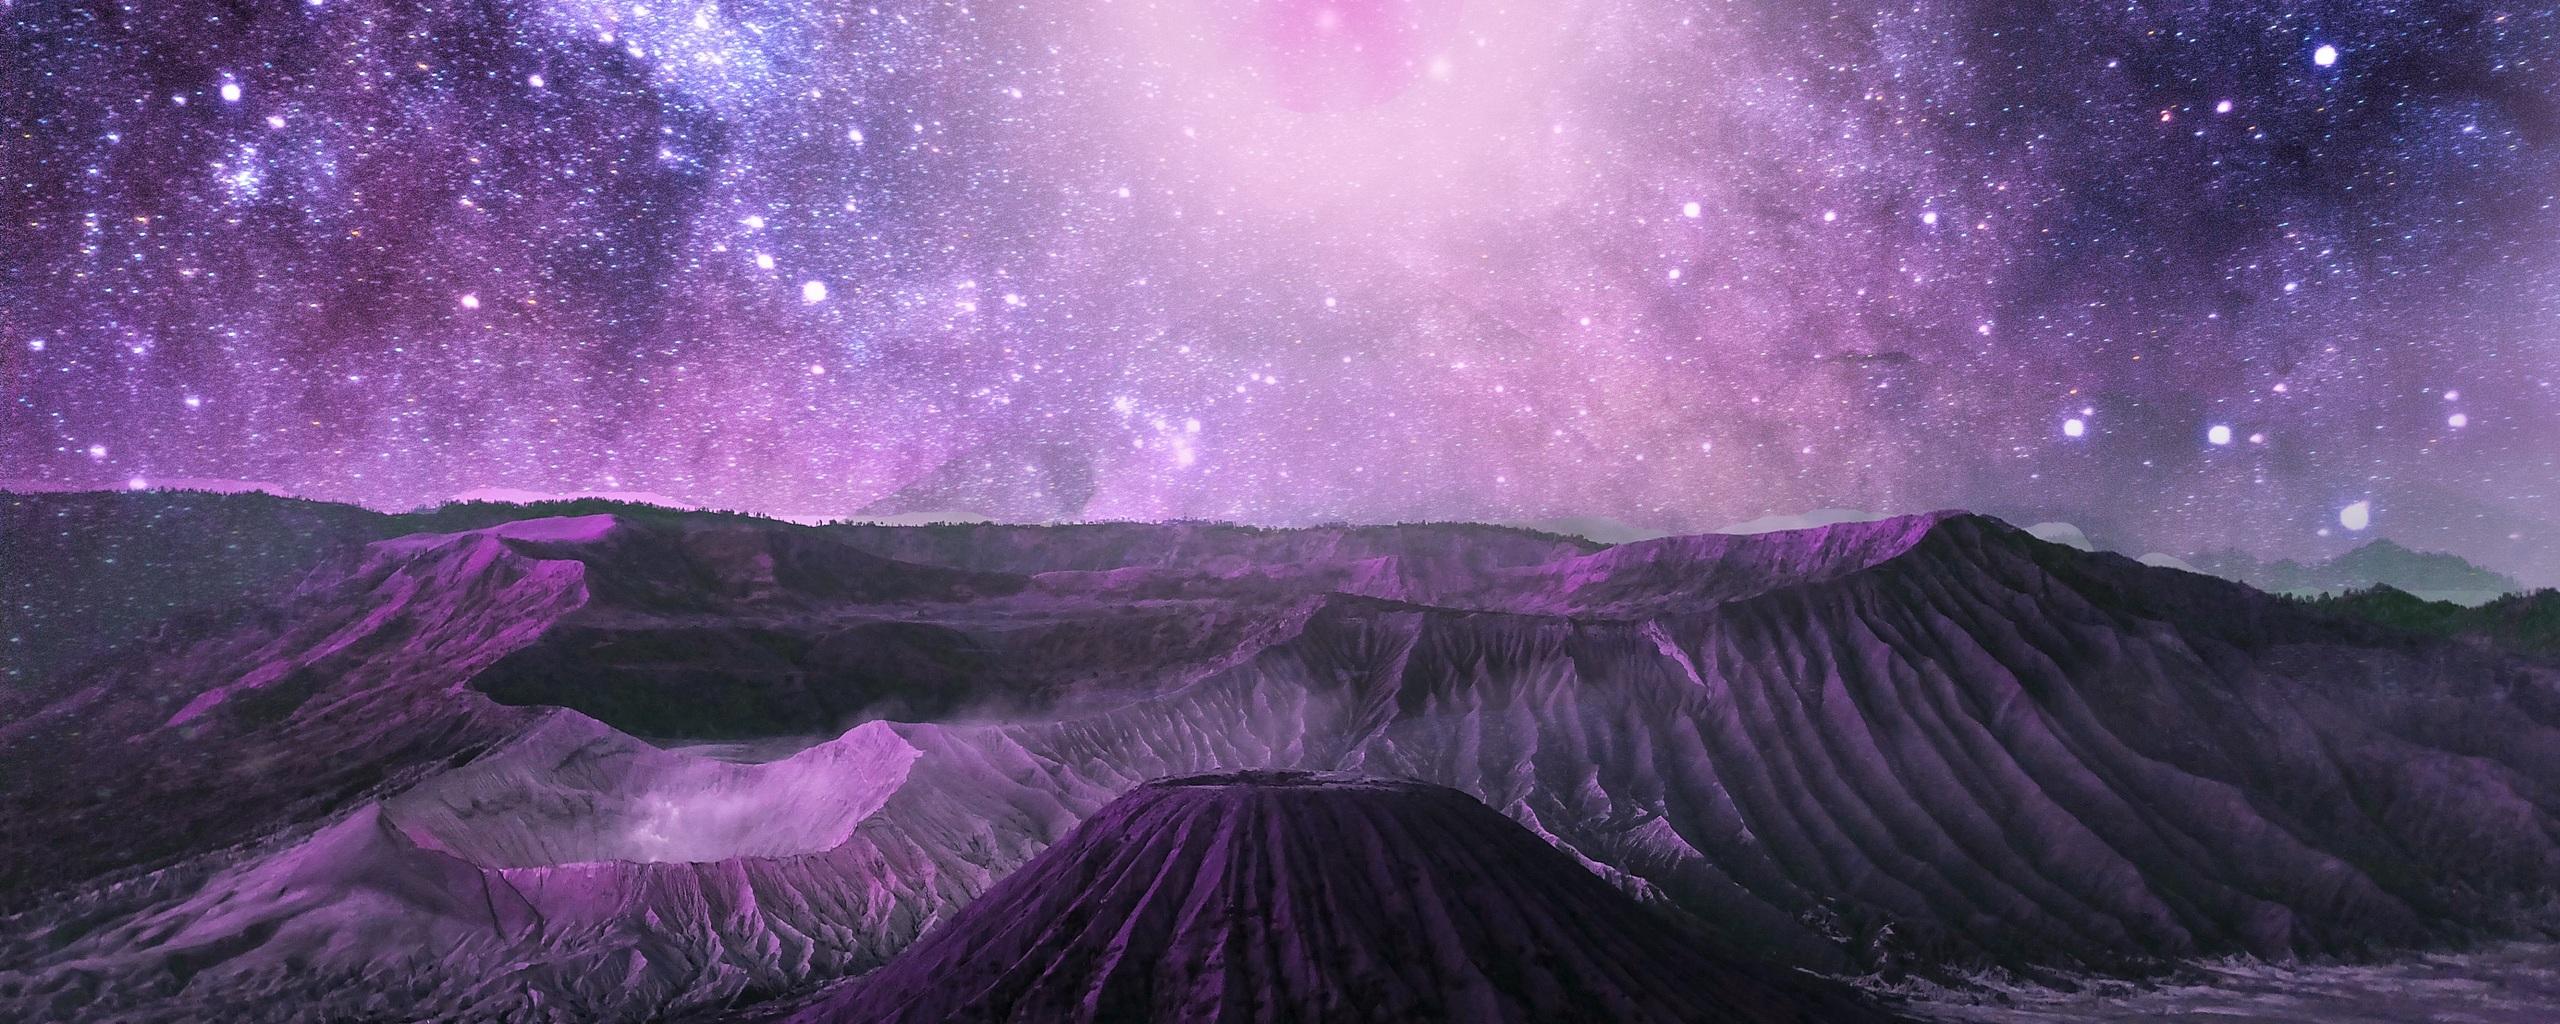 galaxy-stars-space-cosmos-xs.jpg